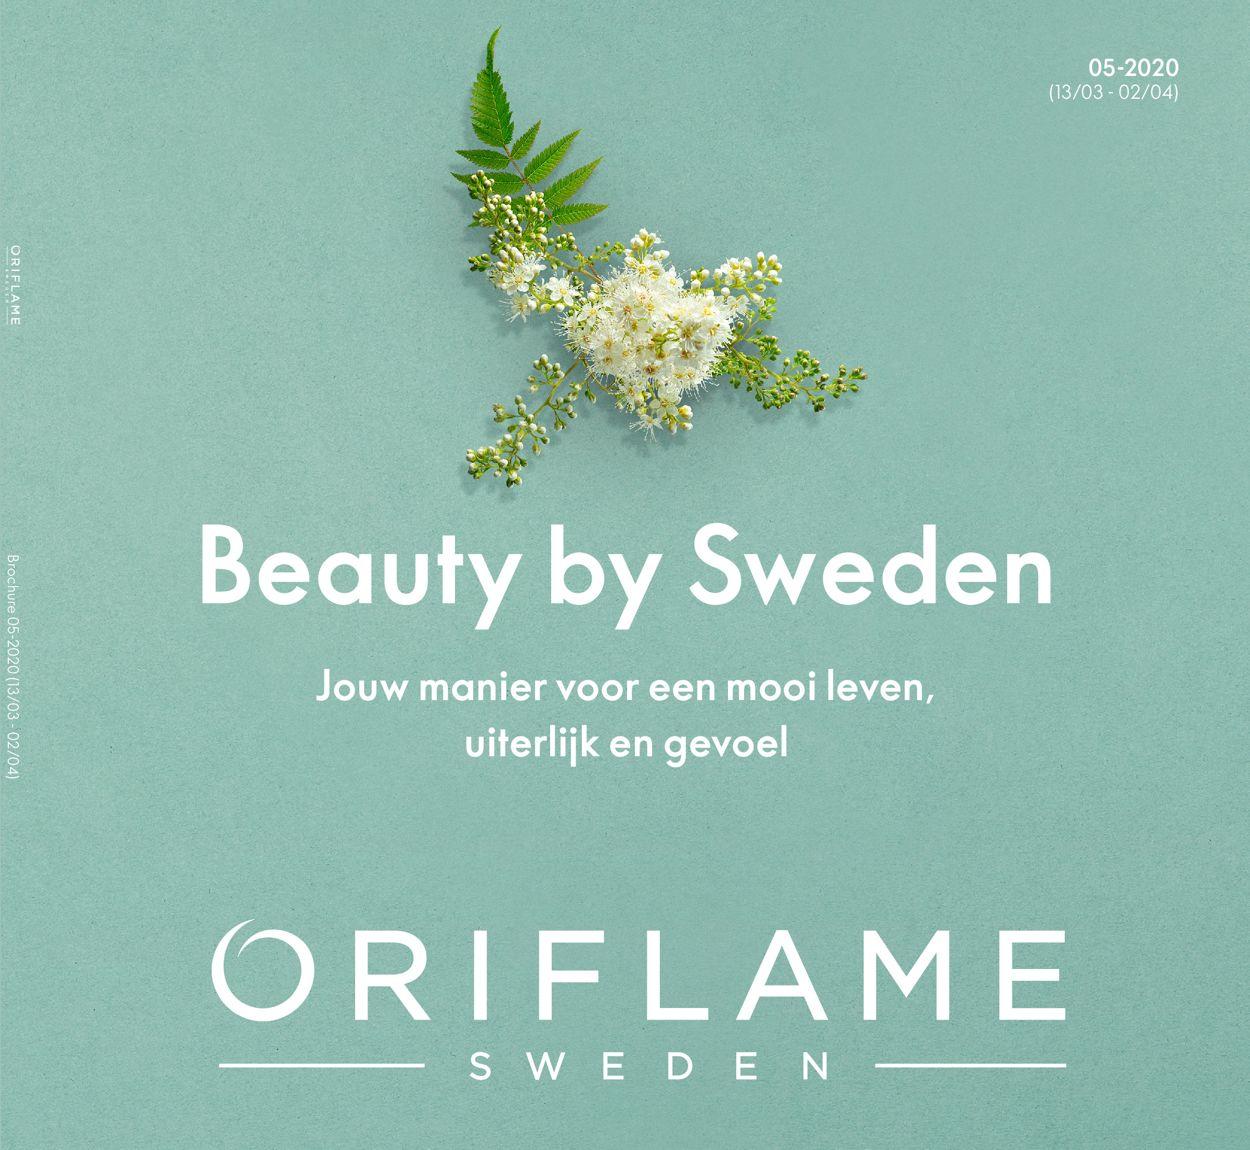 Oriflame Folder - 13.03-02.04.2020